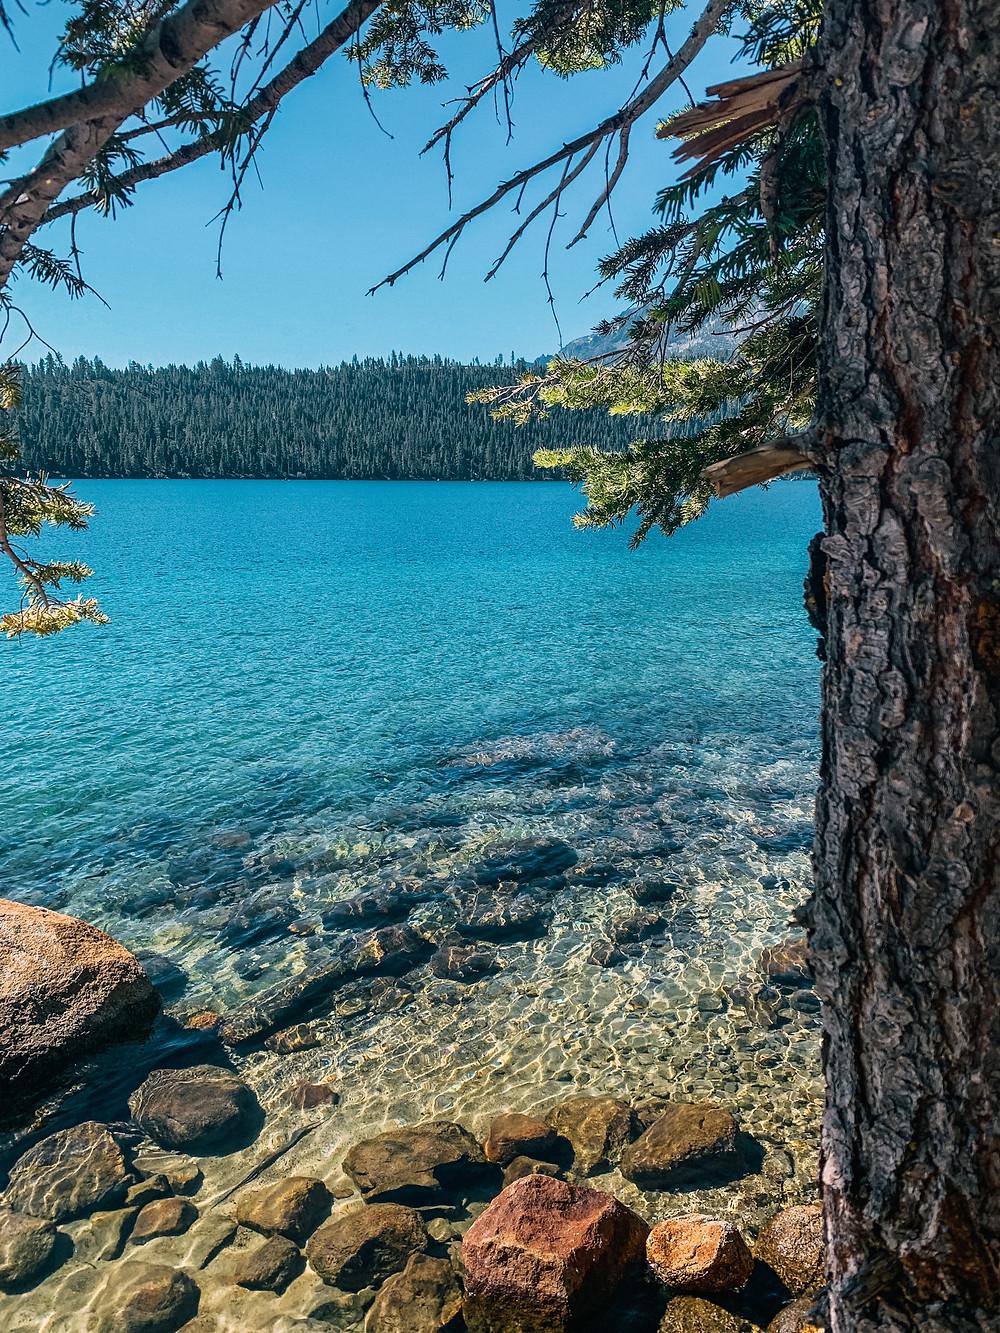 Lake Tahoe Packing List - Lake Tahoe Covid 19